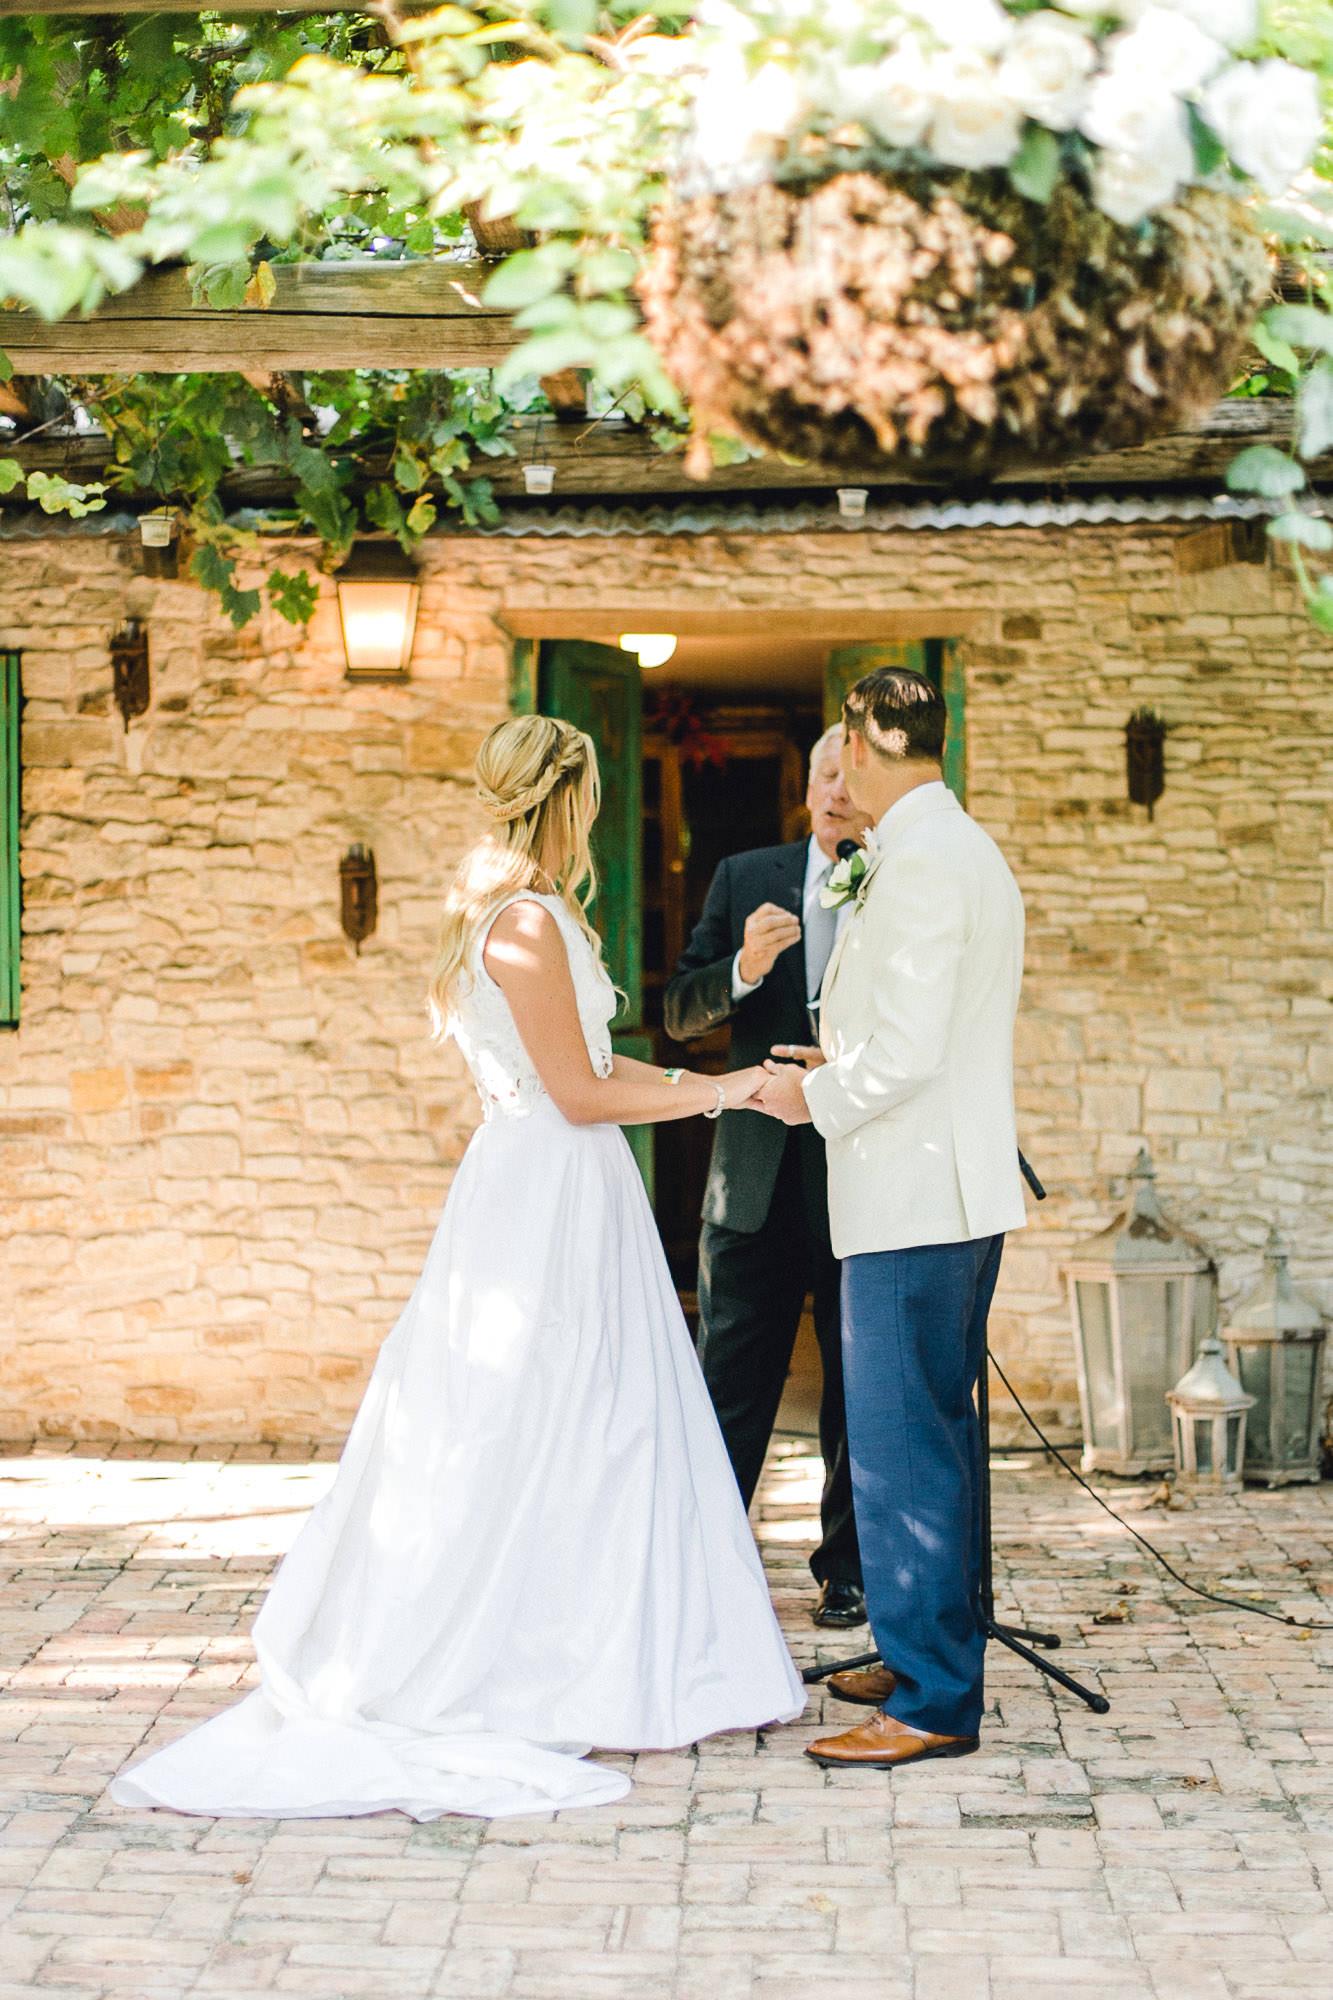 ali-brandon-hamilton-lubbock-wedding-photographer-estate-lee-lewis-construction-bee-alleej_0062.jpg